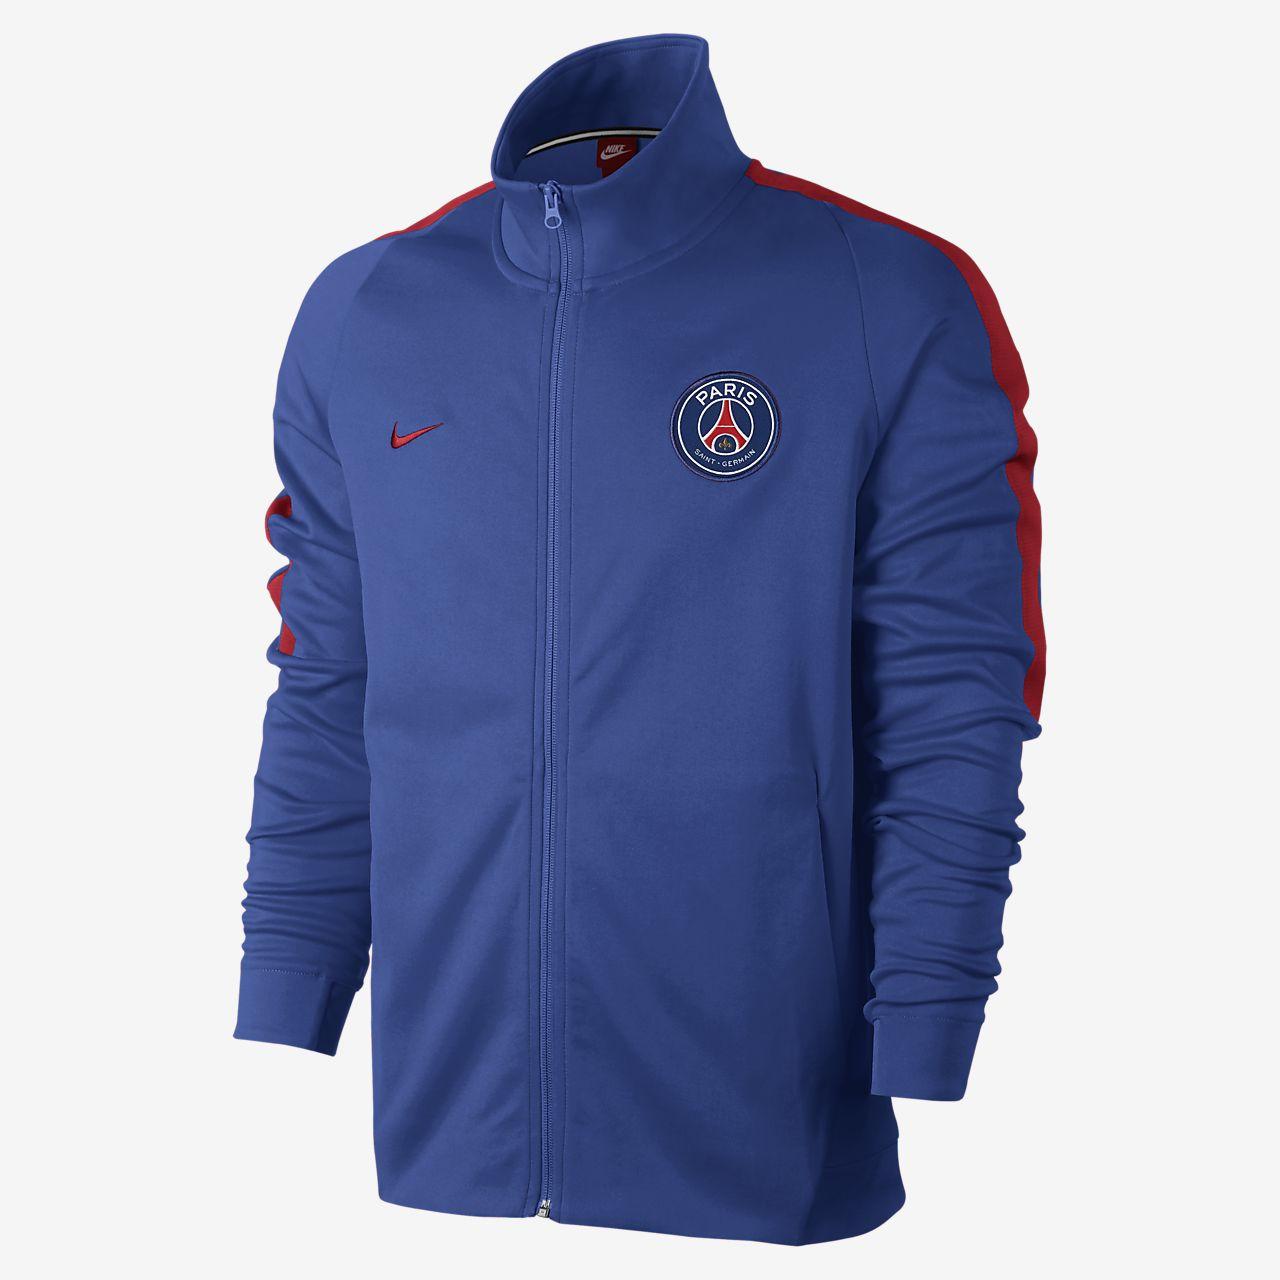 saint paris men Find the 2018/19 paris saint-germain stadium home men's soccer jersey at nikecom enjoy free shipping and returns with nikeplus.